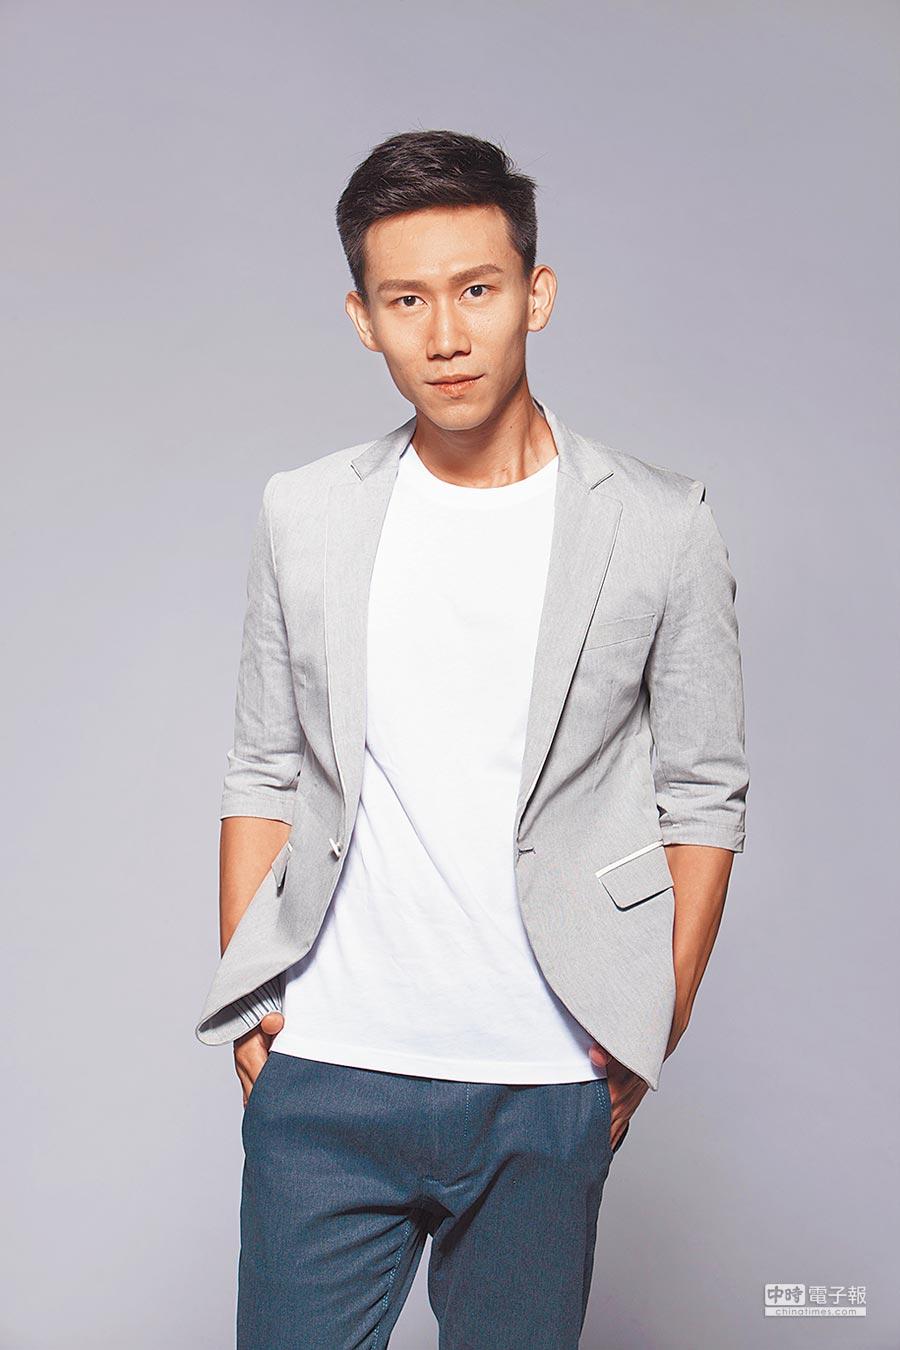 Cai Cheng Yi